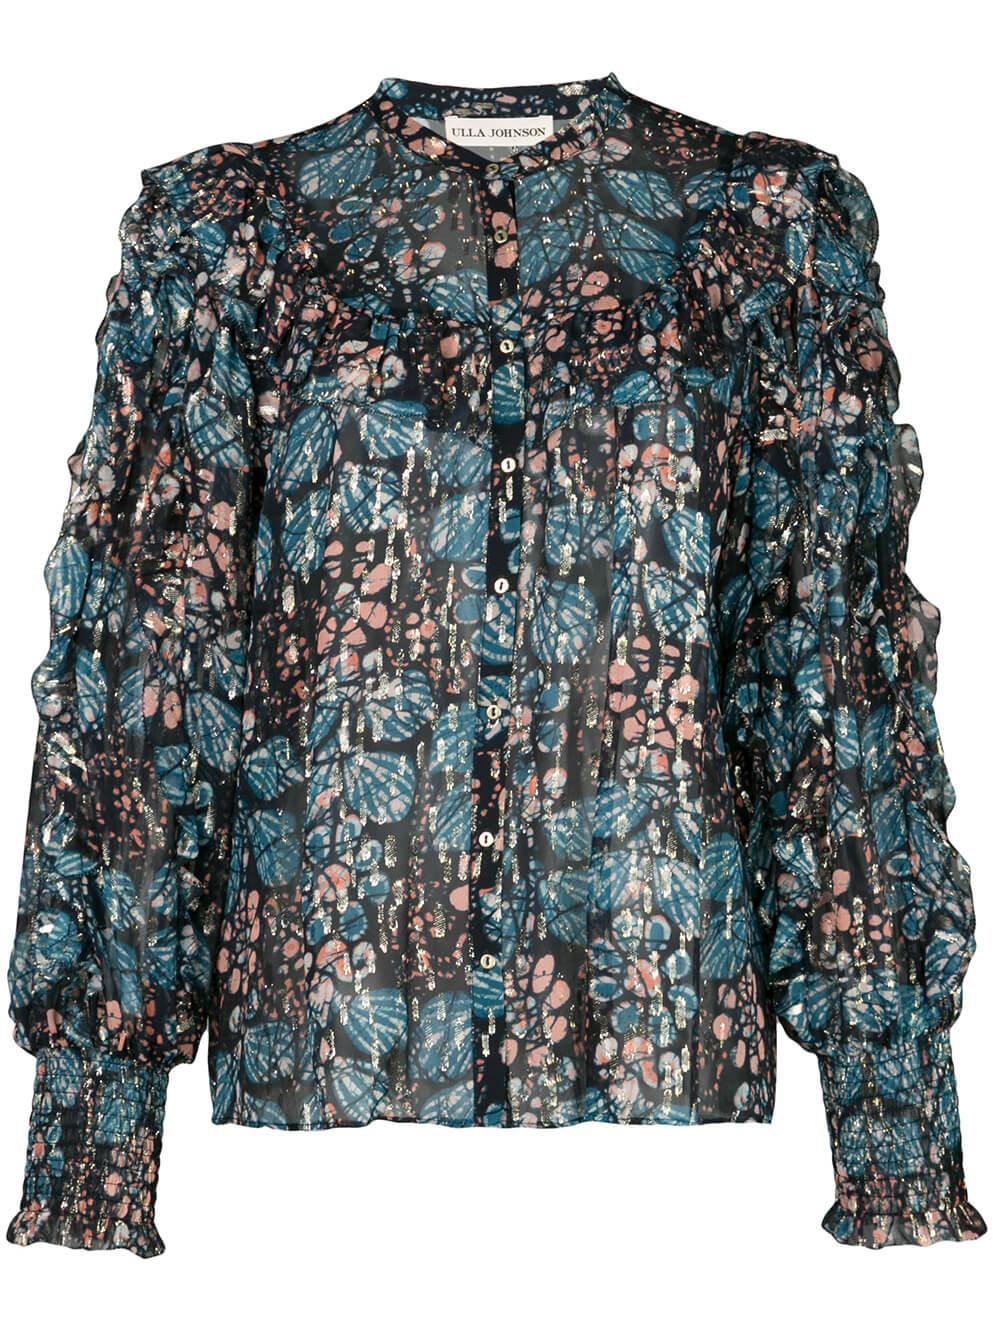 Isadora Full Sleeve Metallic Blouse Item # PS200222